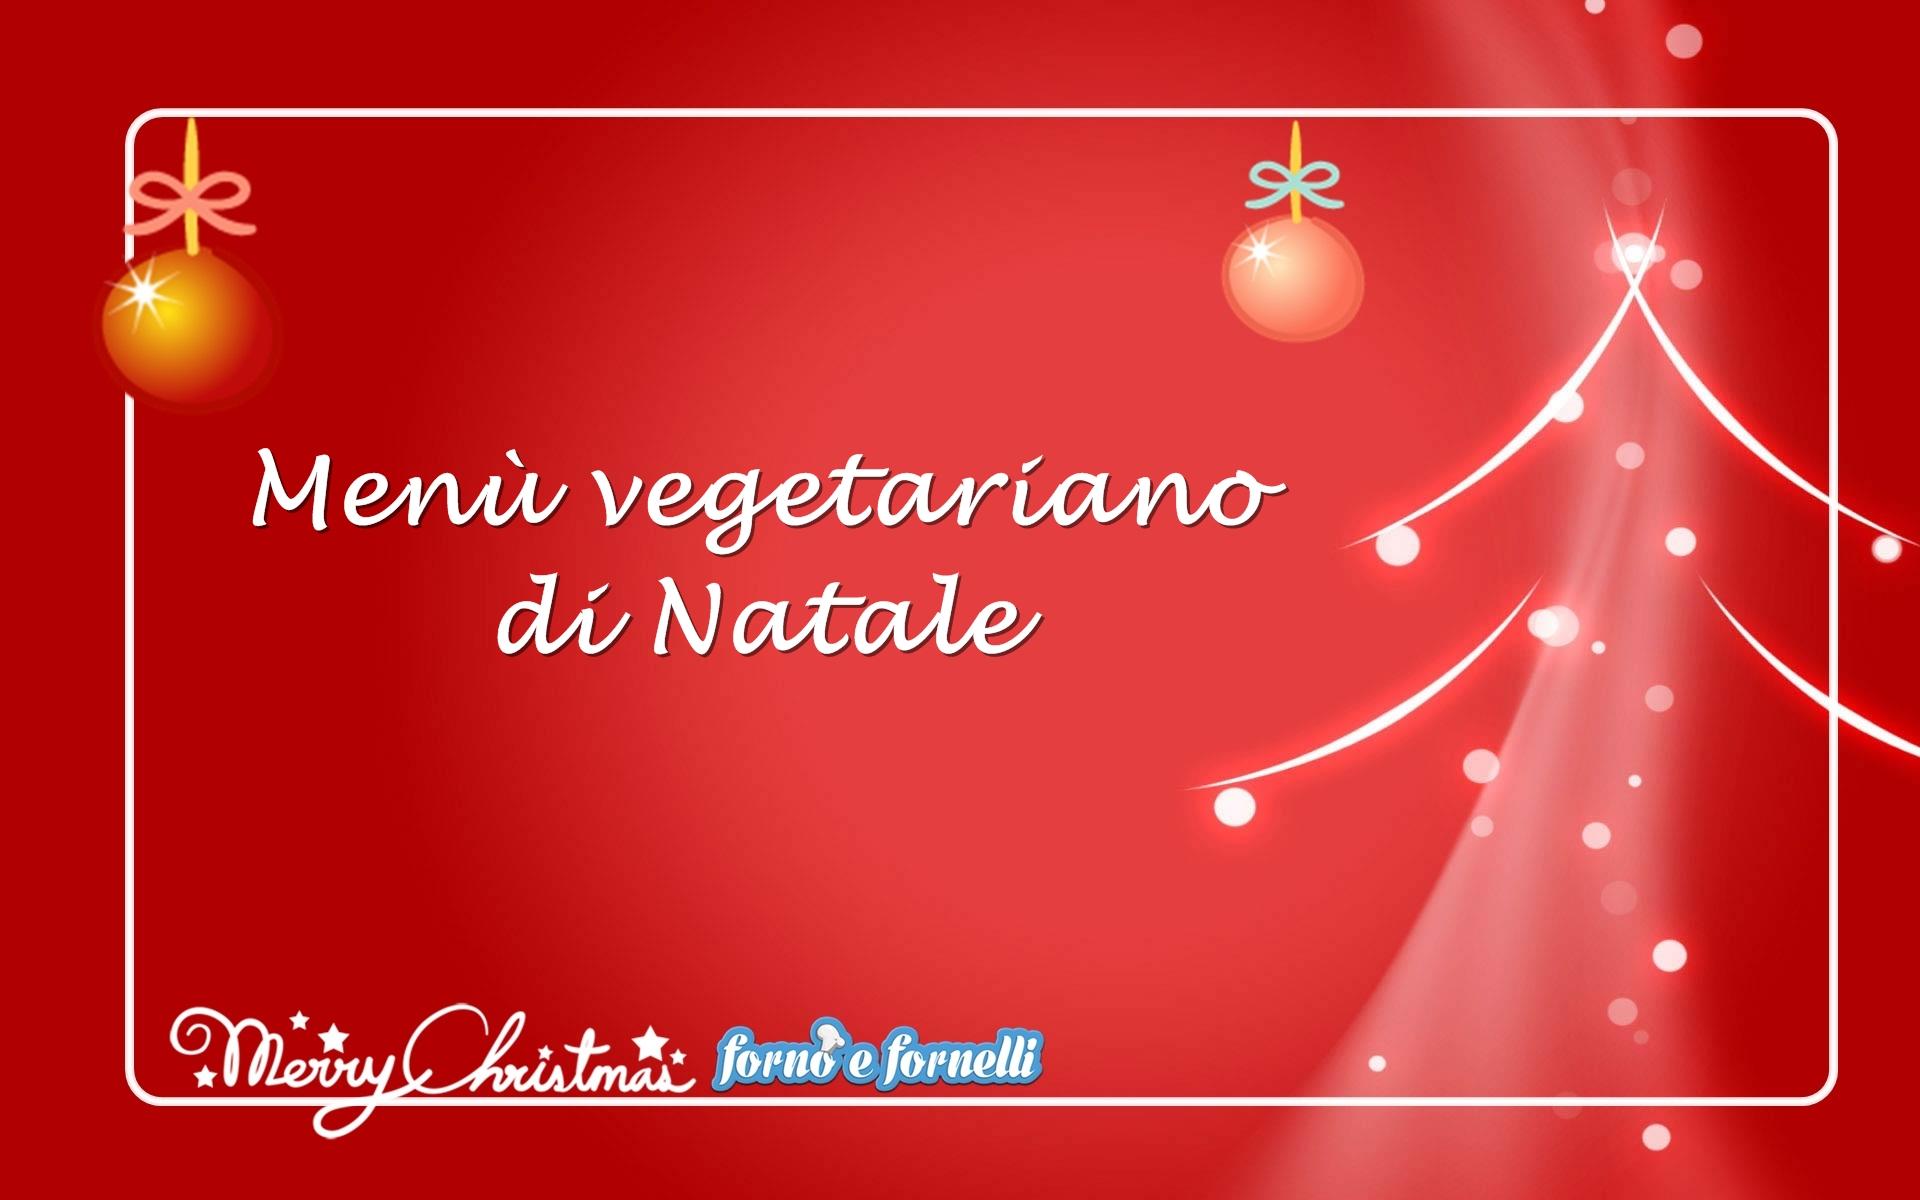 Menù vegetariano di Natale